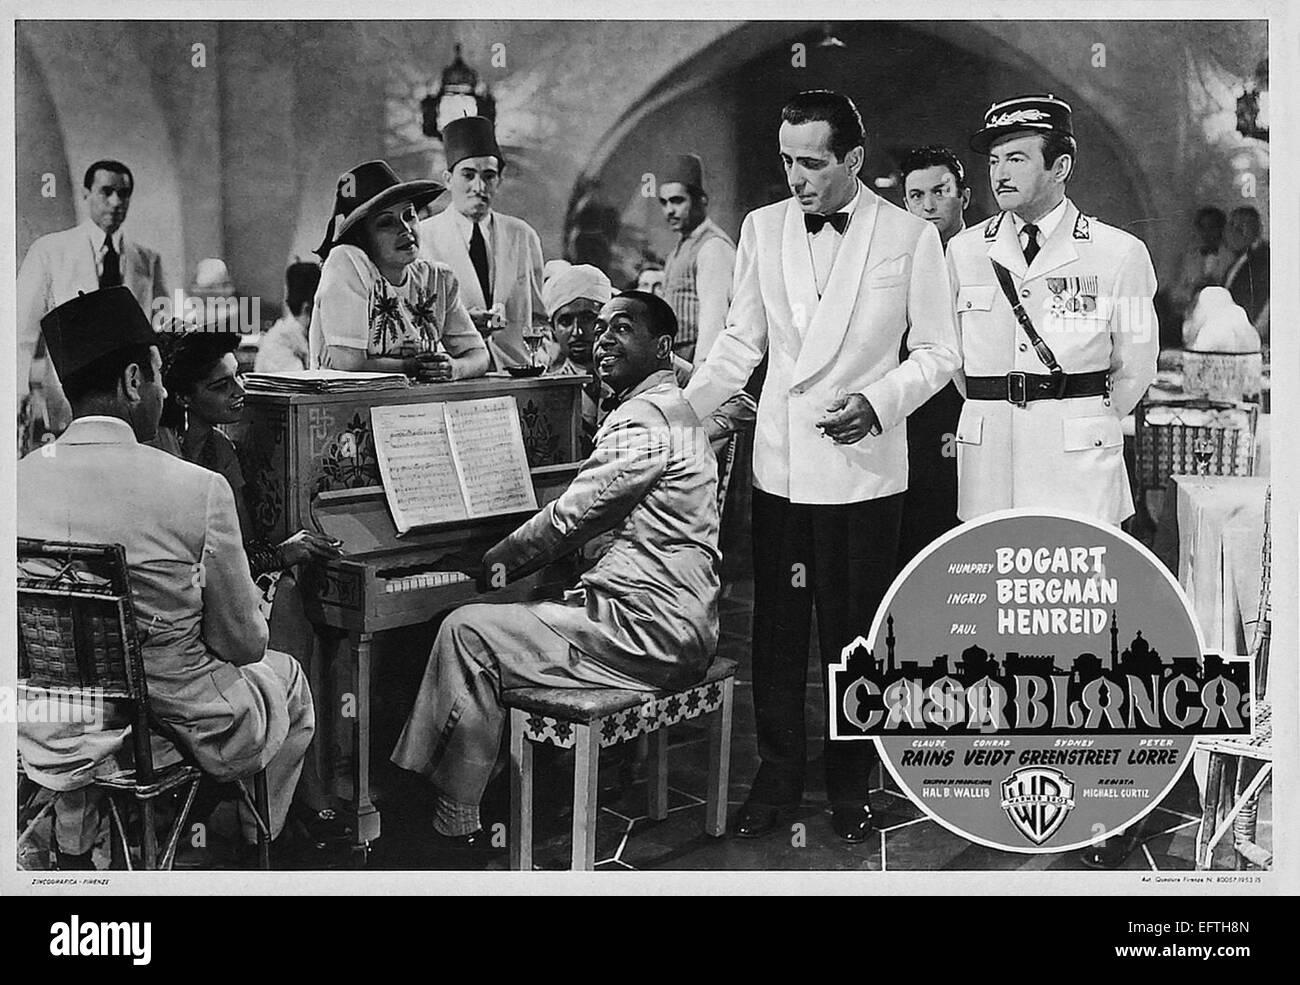 Casablanca bogart movie poster